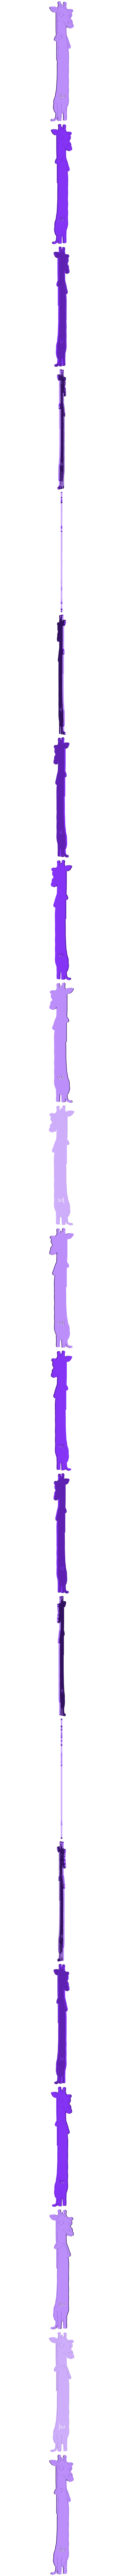 Outline.stl Download free STL file Reverse Giraffe - Rick and Morty • 3D printable design, JayOmega